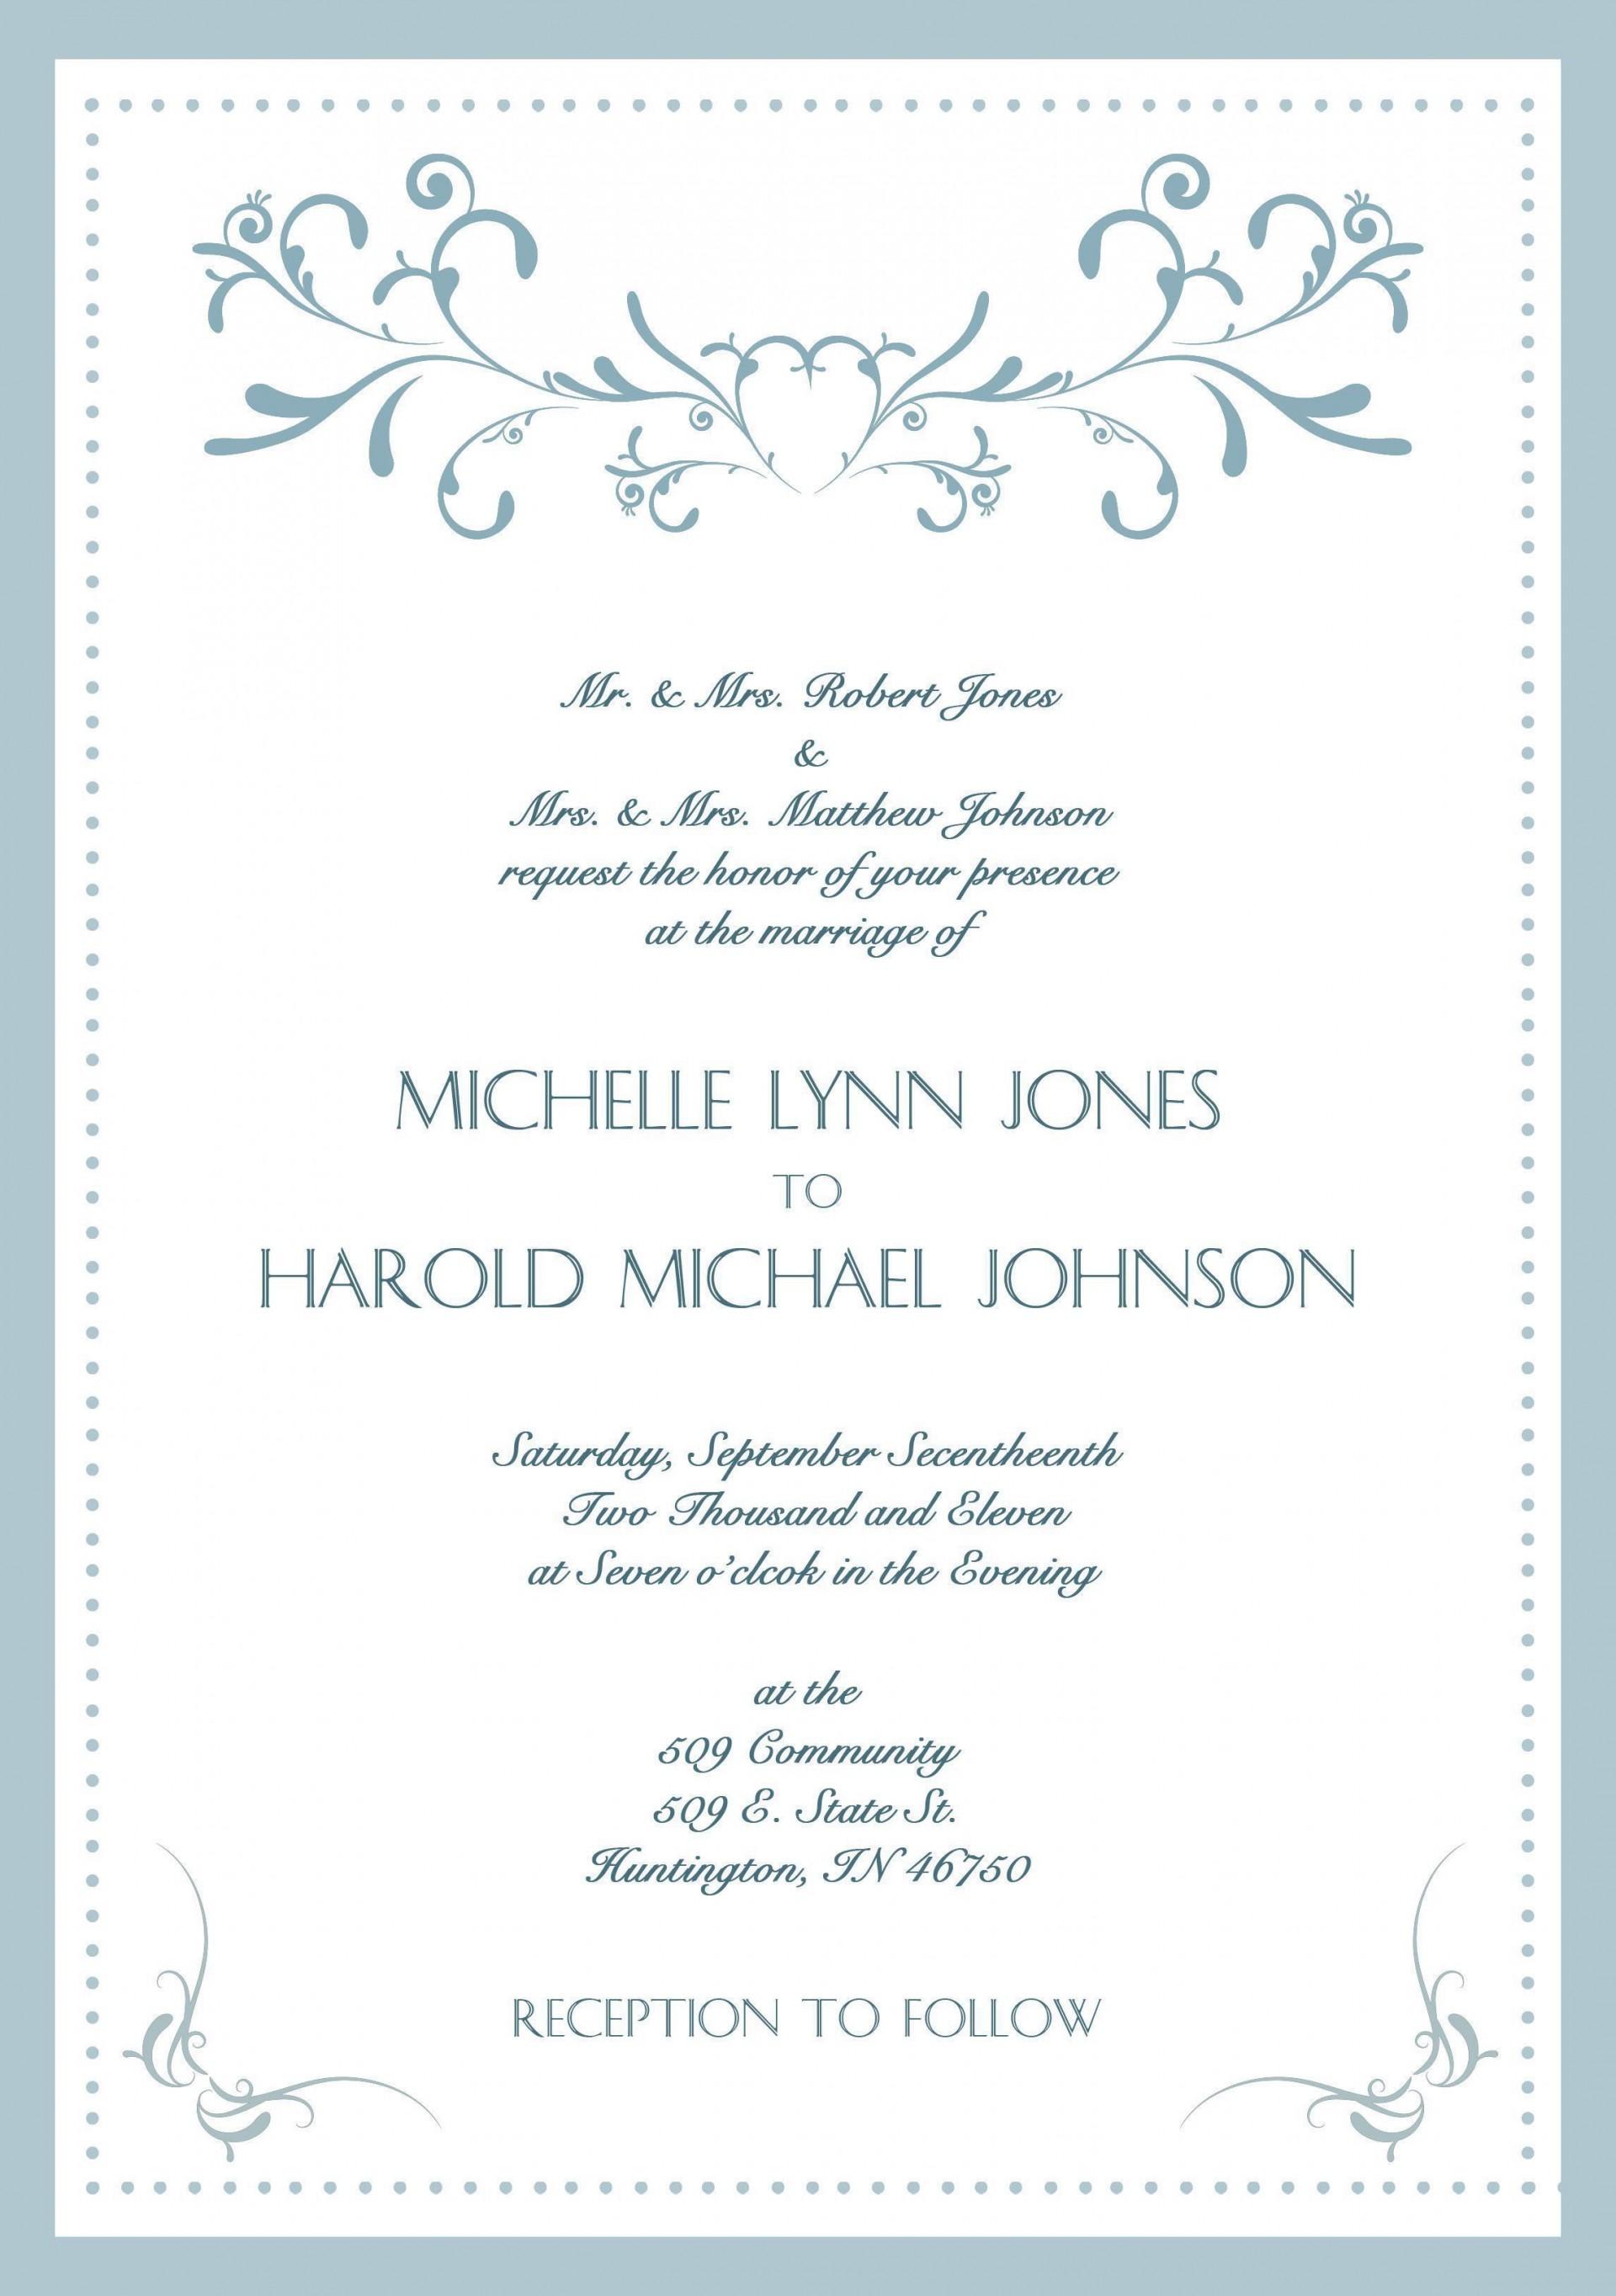 000 Dreaded Sample Wedding Invitation Card Template Photo  Templates Free Design Response Wording1920